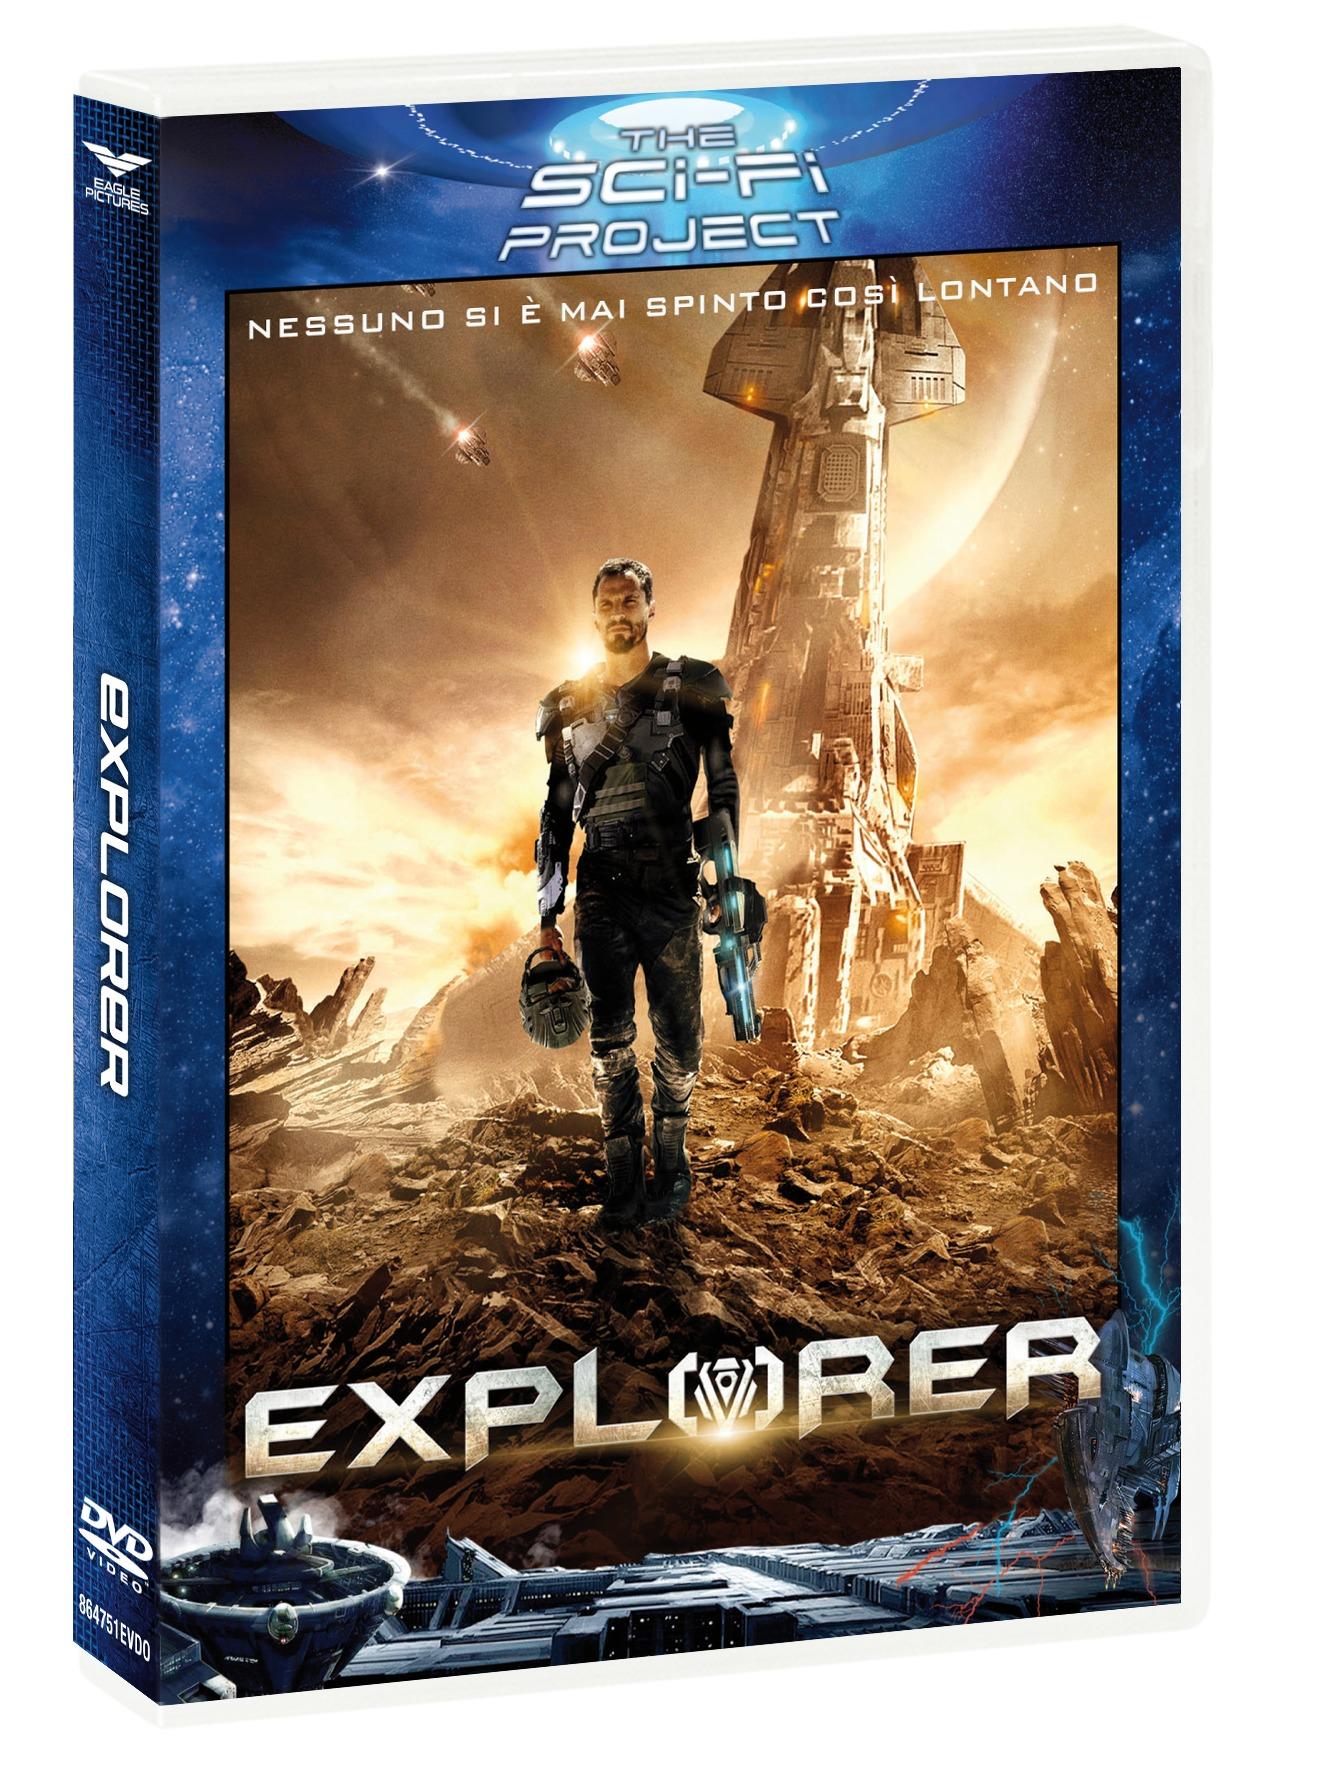 EXPLORER (DVD)